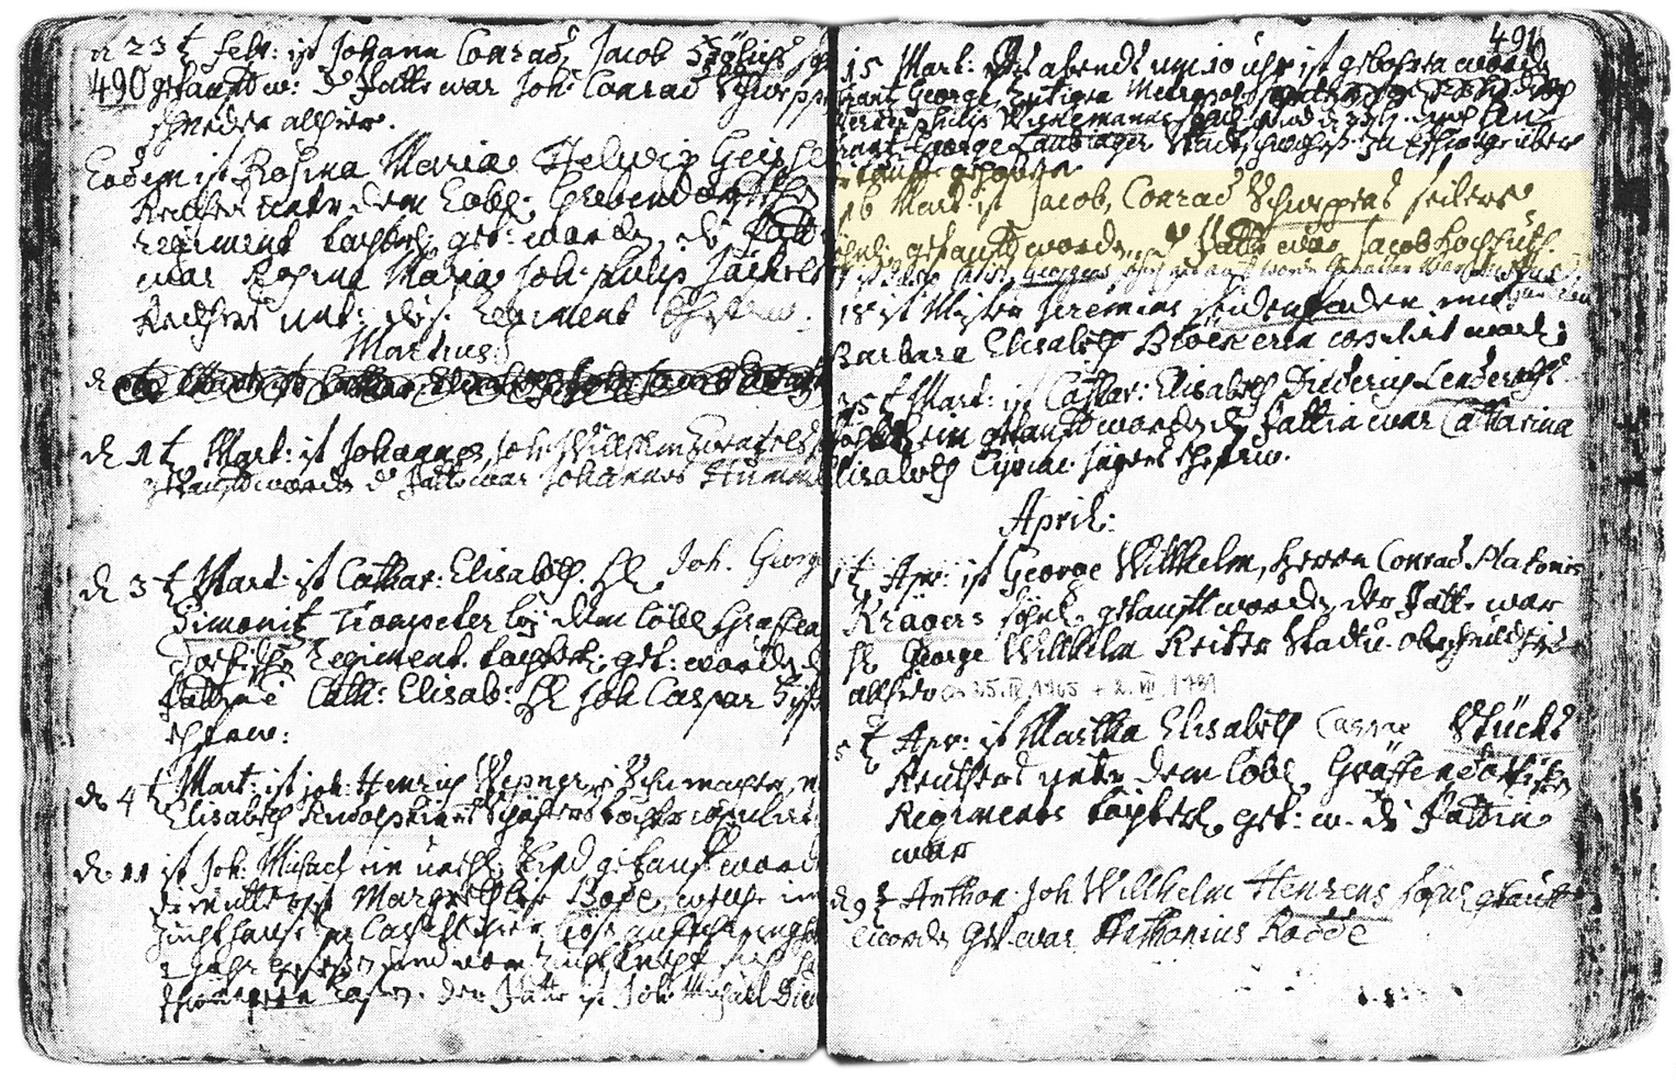 Jacob Schweppe Taufeintrag 1740 KB Witzenhausen markiert.jpg